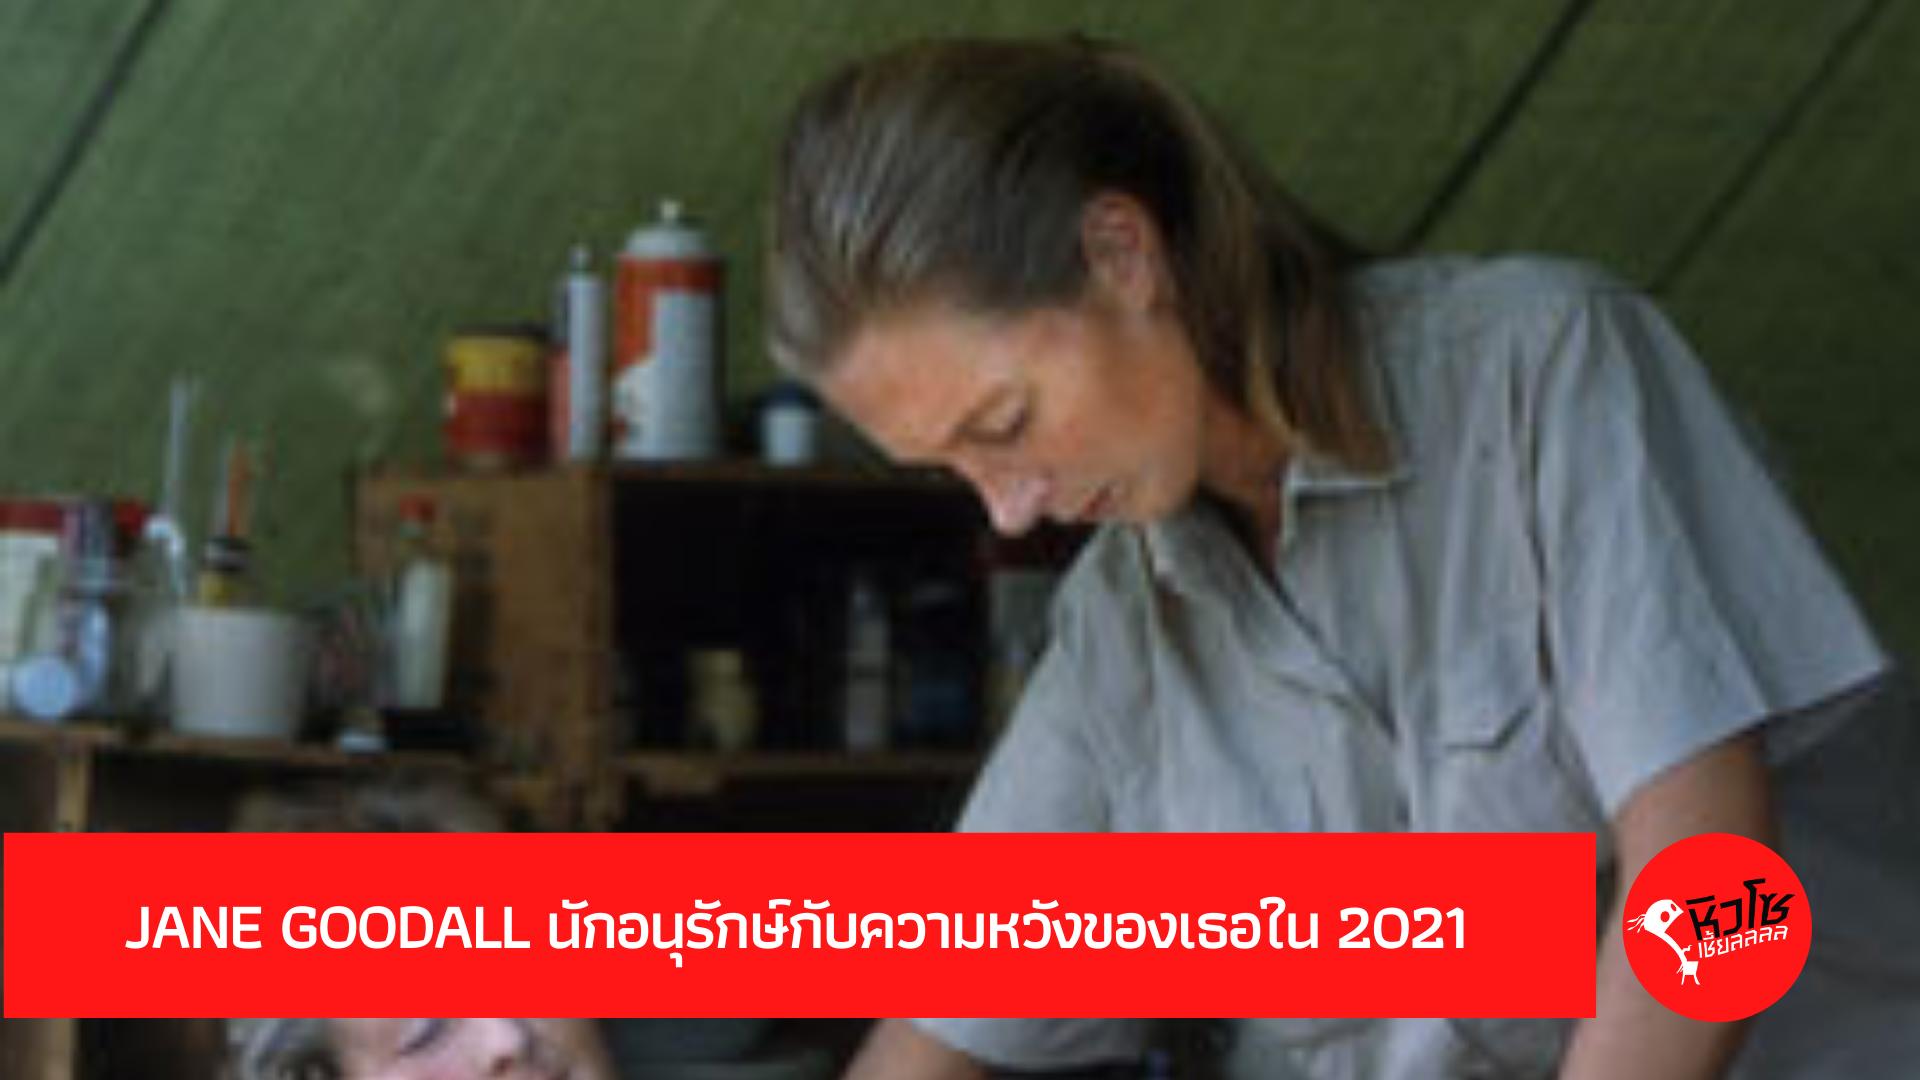 Jane Goodall นักอนุรักษ์กับความหวังของเธอใน 2021